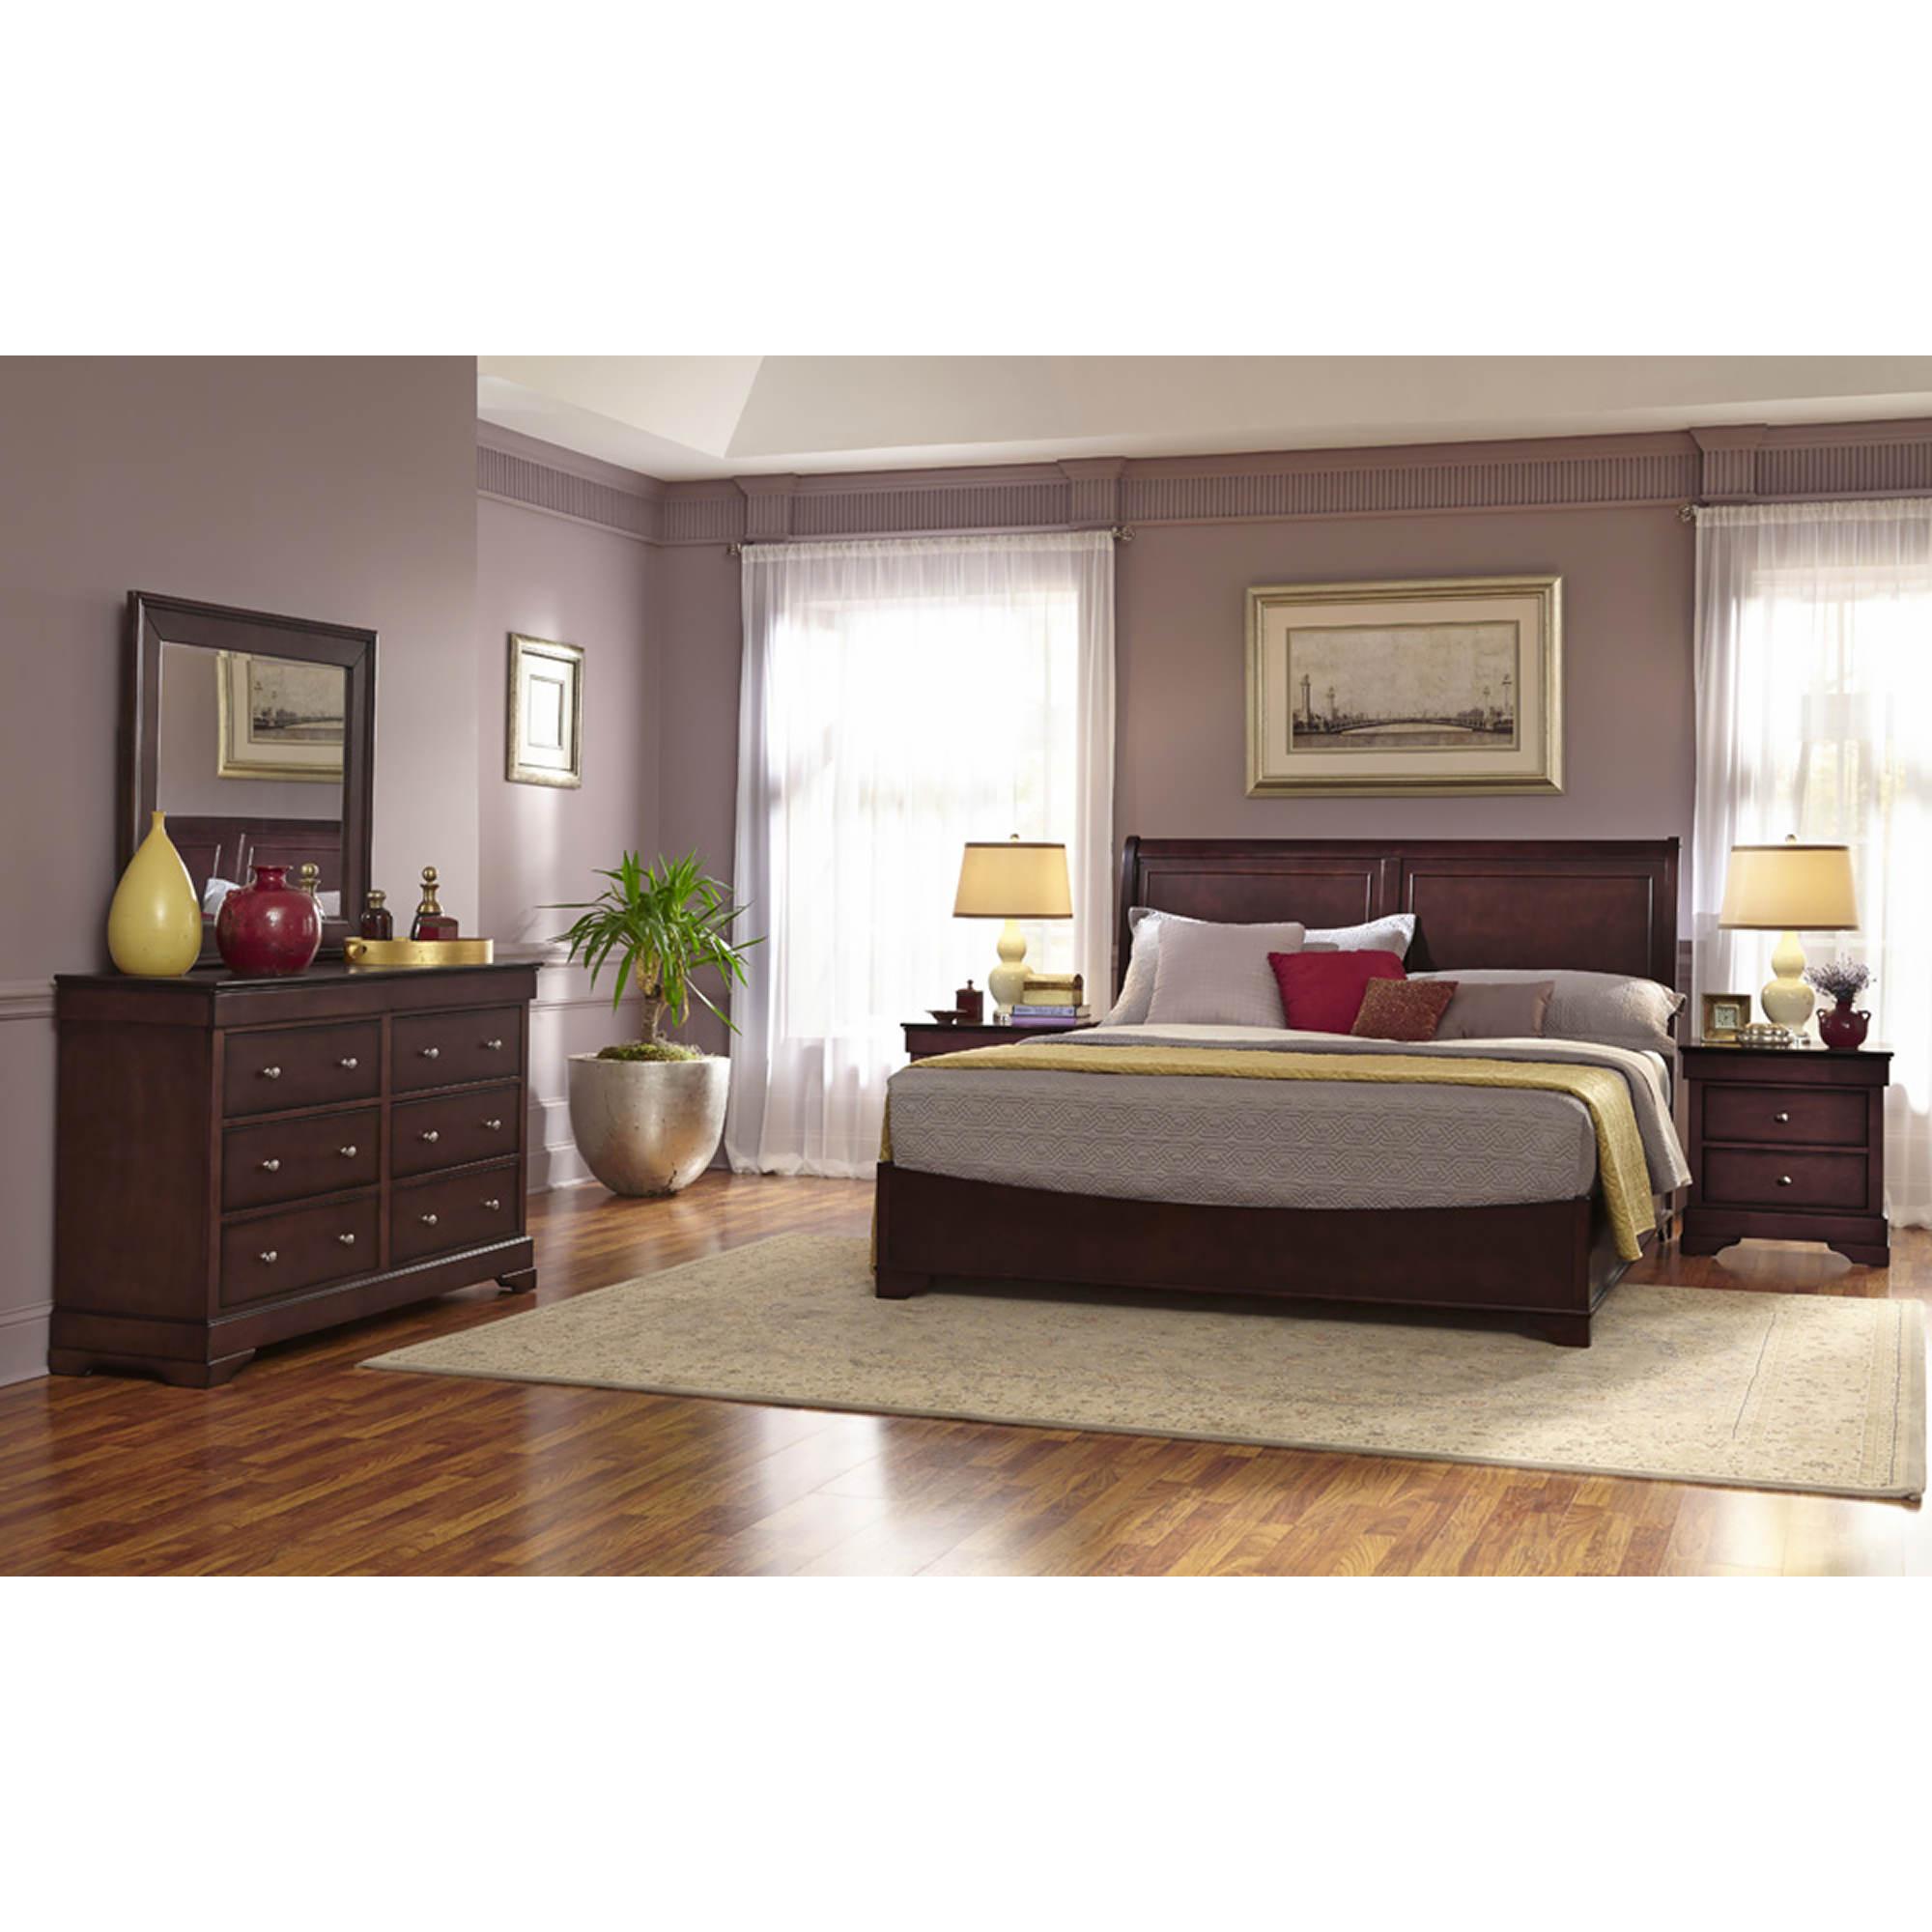 Espresso Bedroom Set – clandestin.info